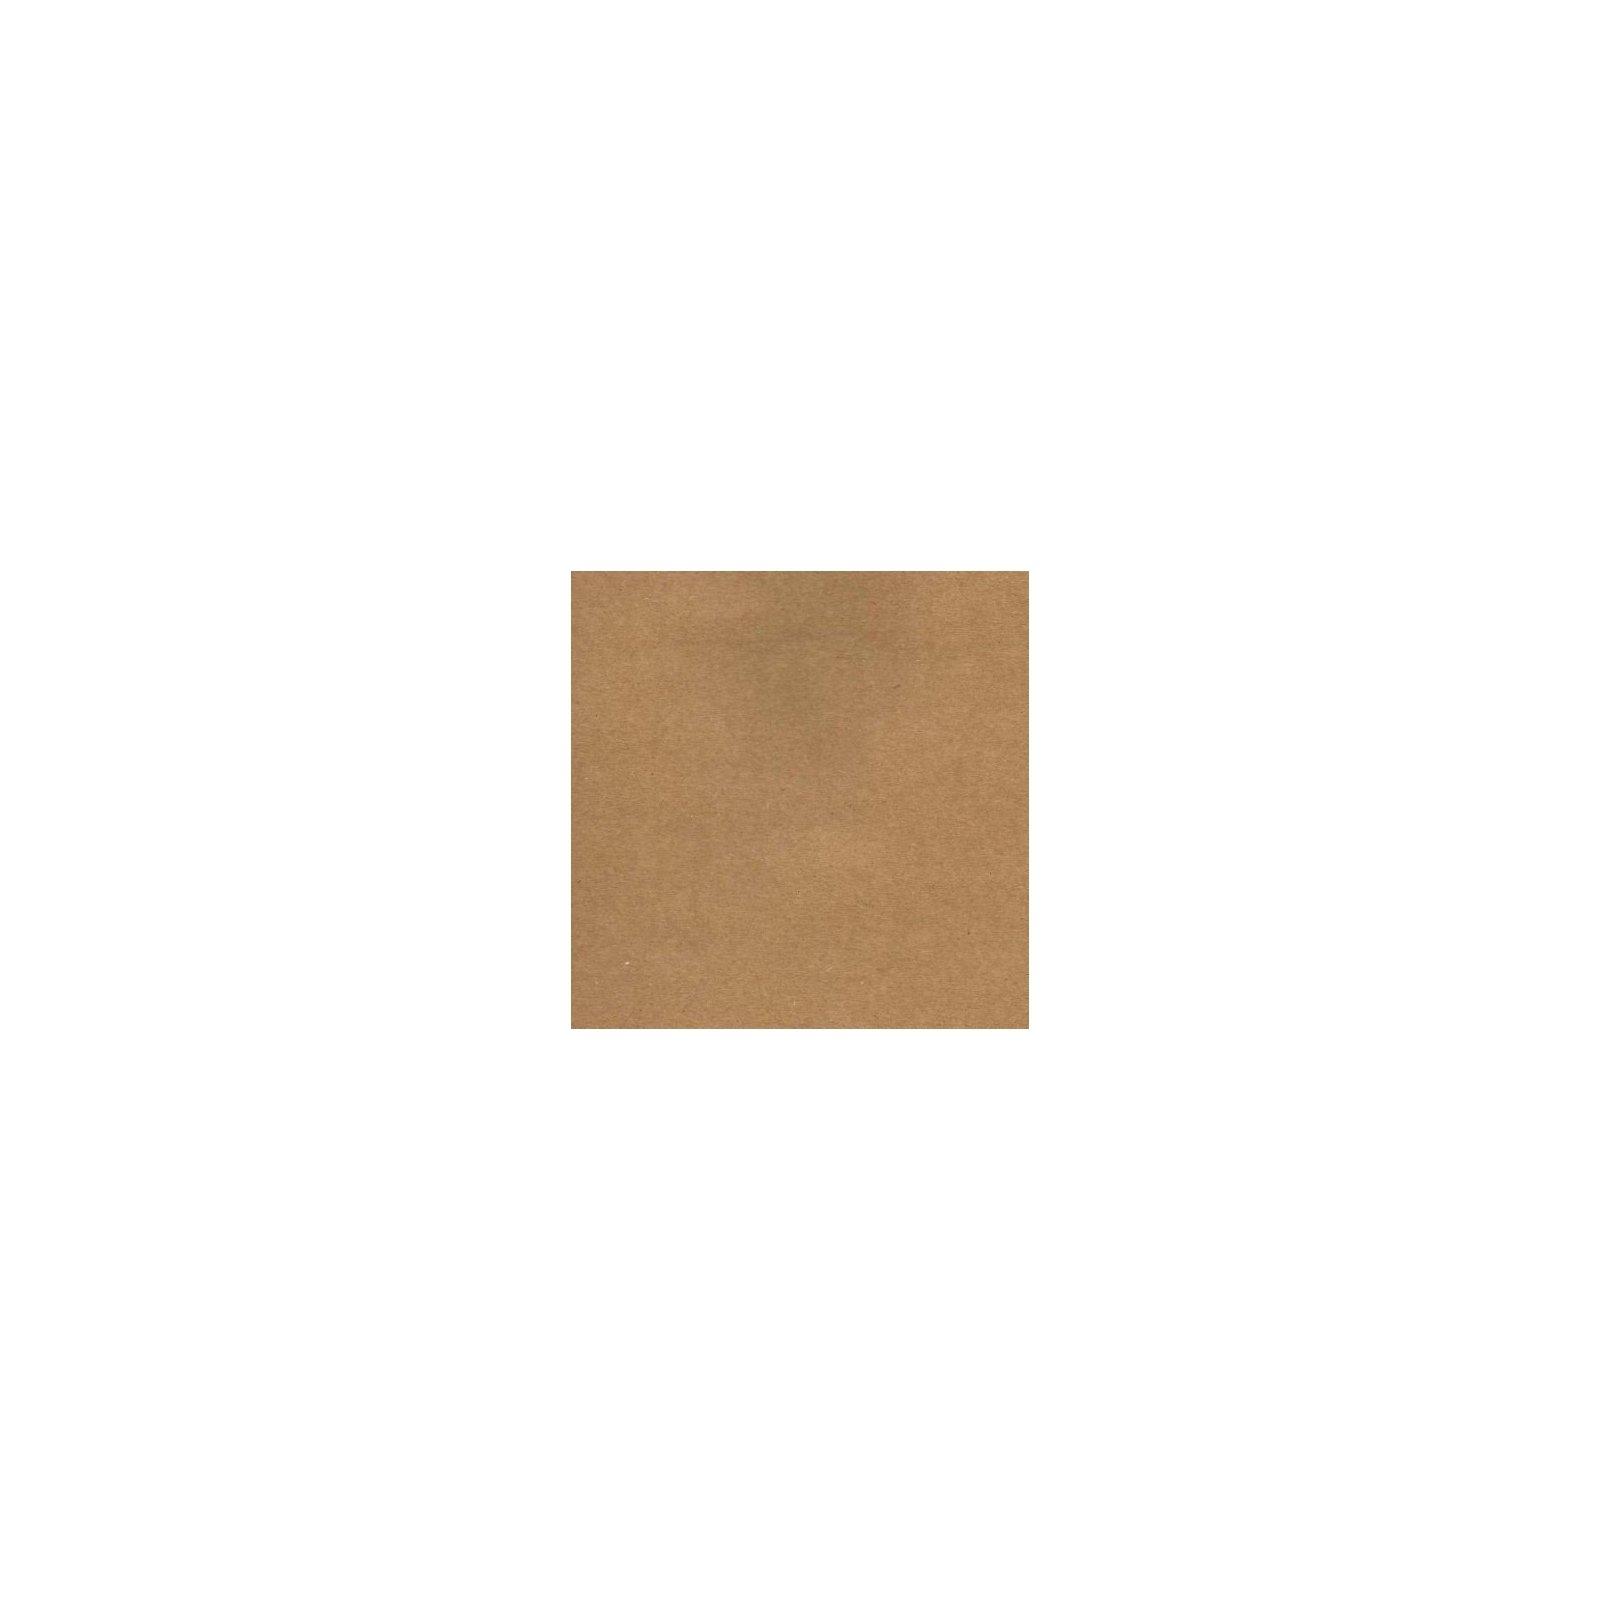 Papier kraft brun lisse - Ephemeria